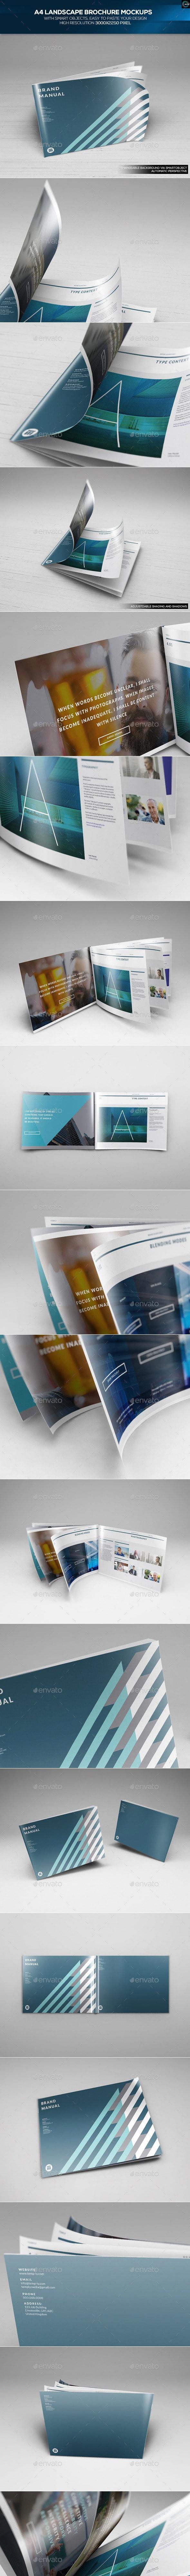 A4 Landscape Brochure Mockups - Brochures Print